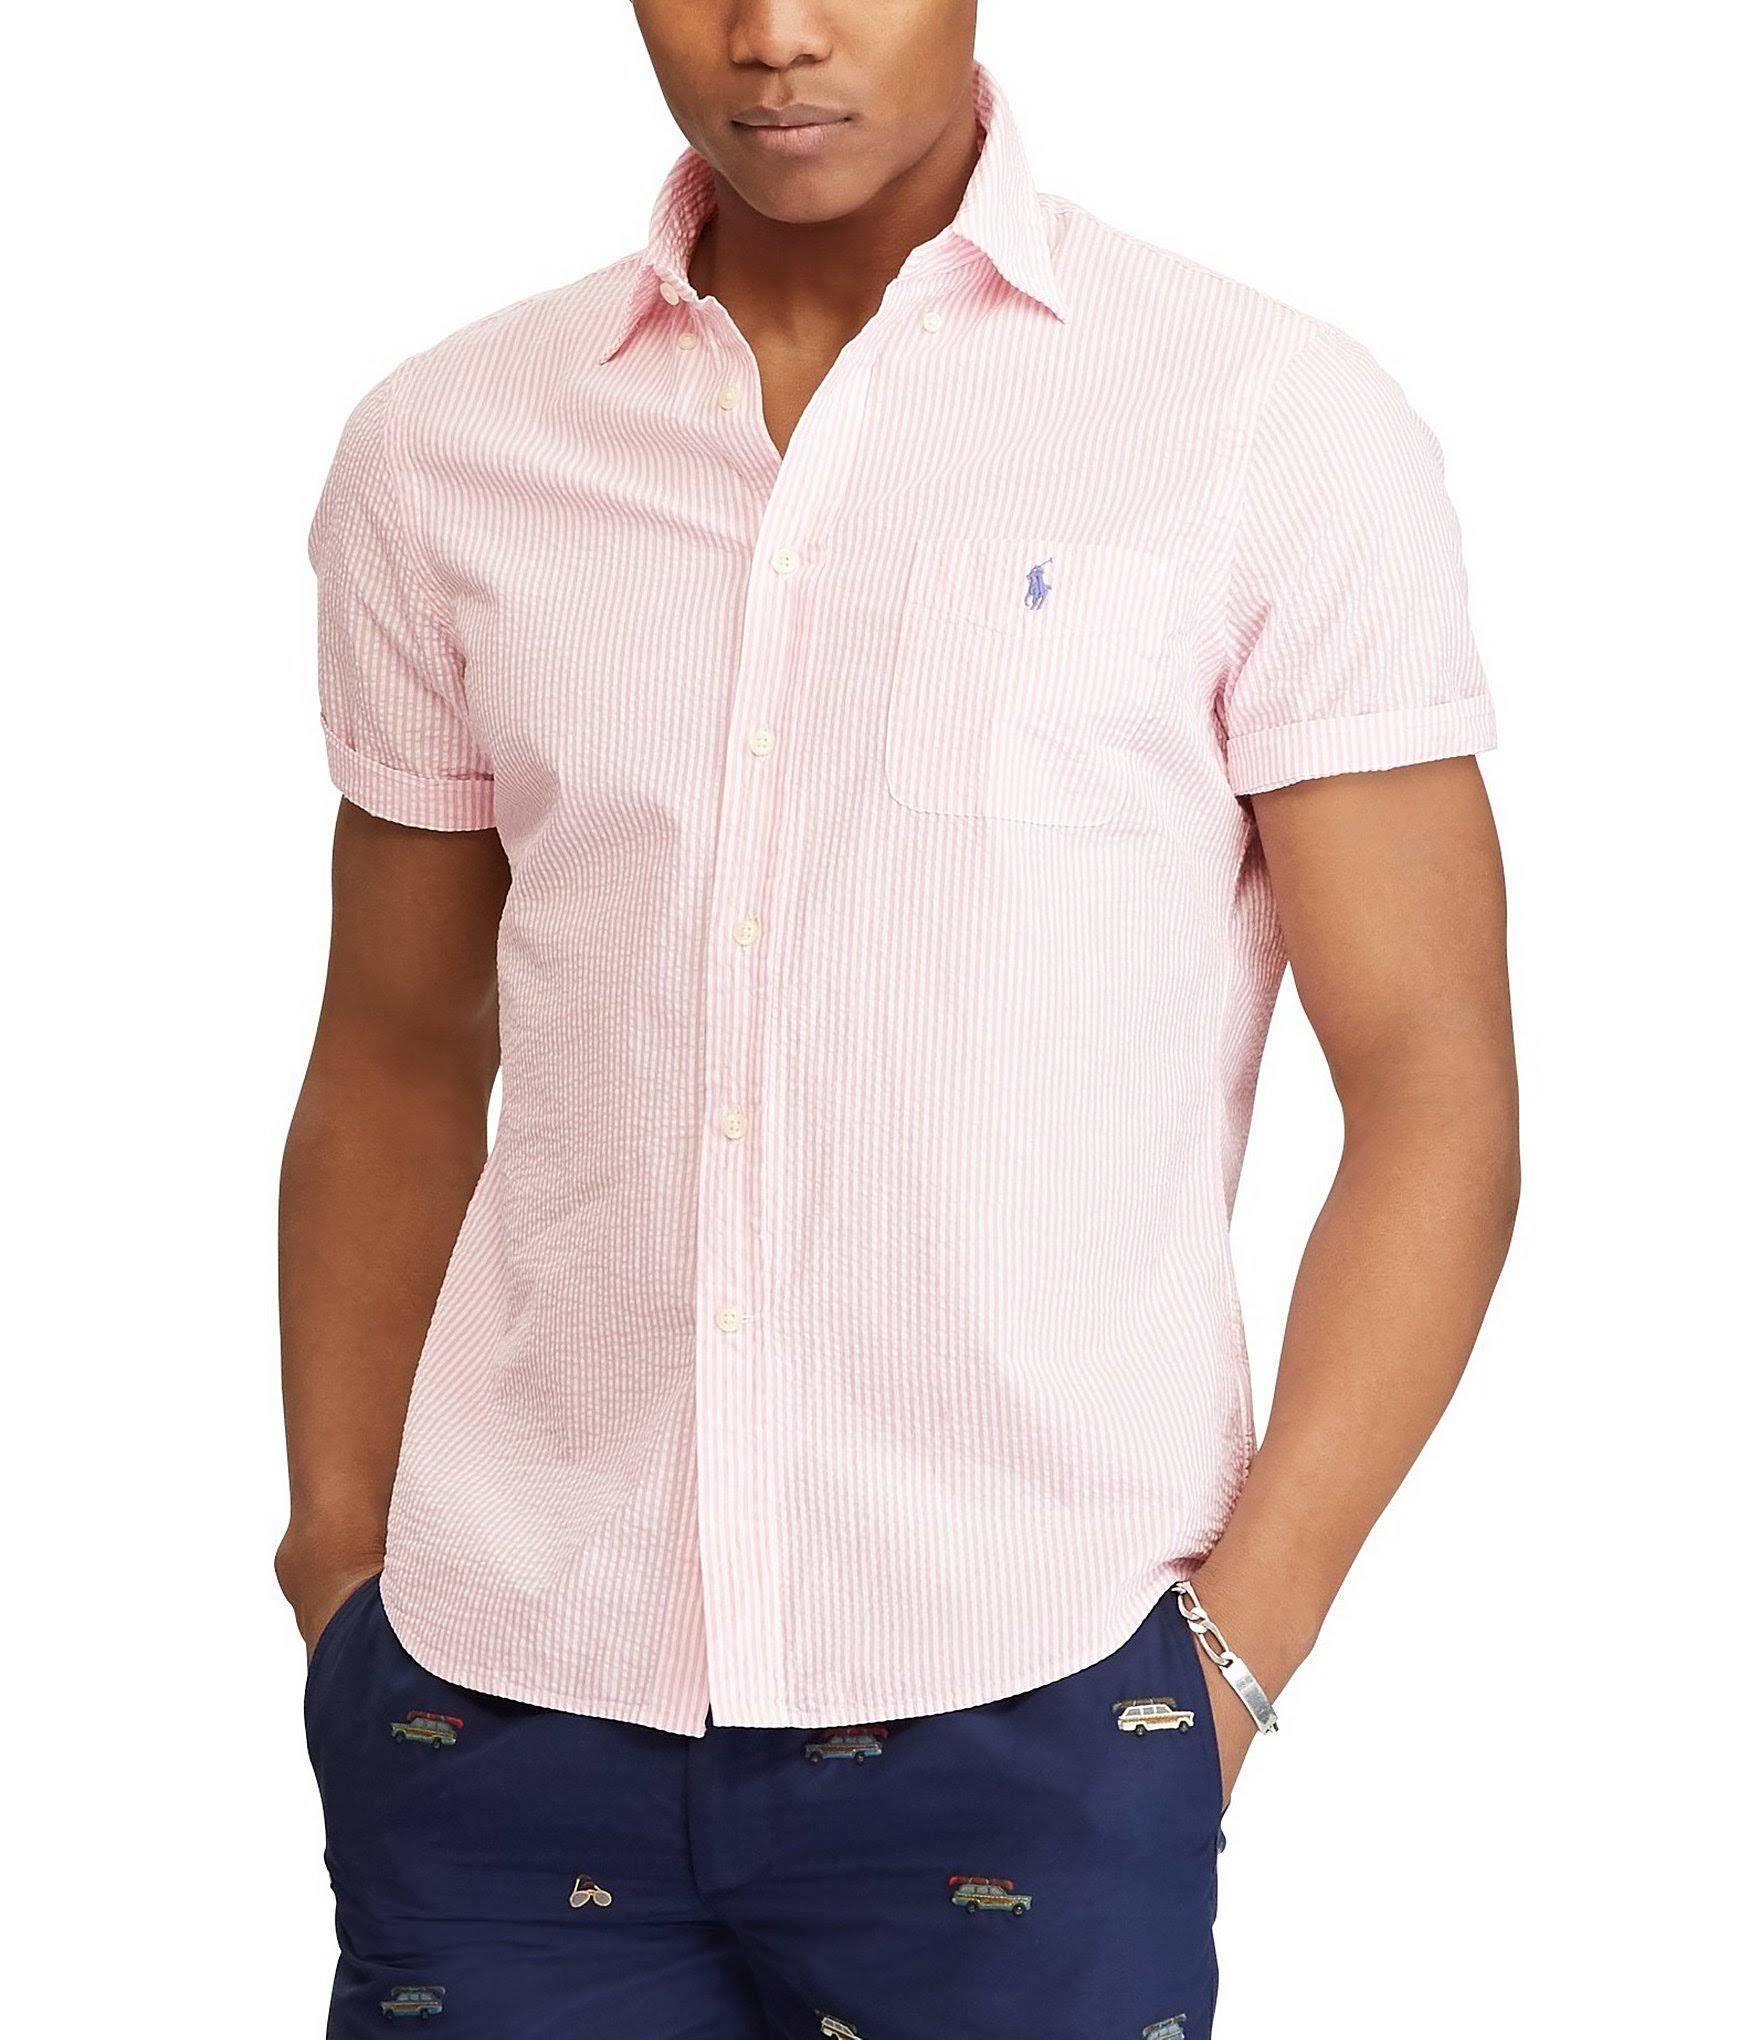 De Hombre Corte Camiseta Ralph Xl Color Clásico Para Deporte Lauren Rosa Polo wp4Ft